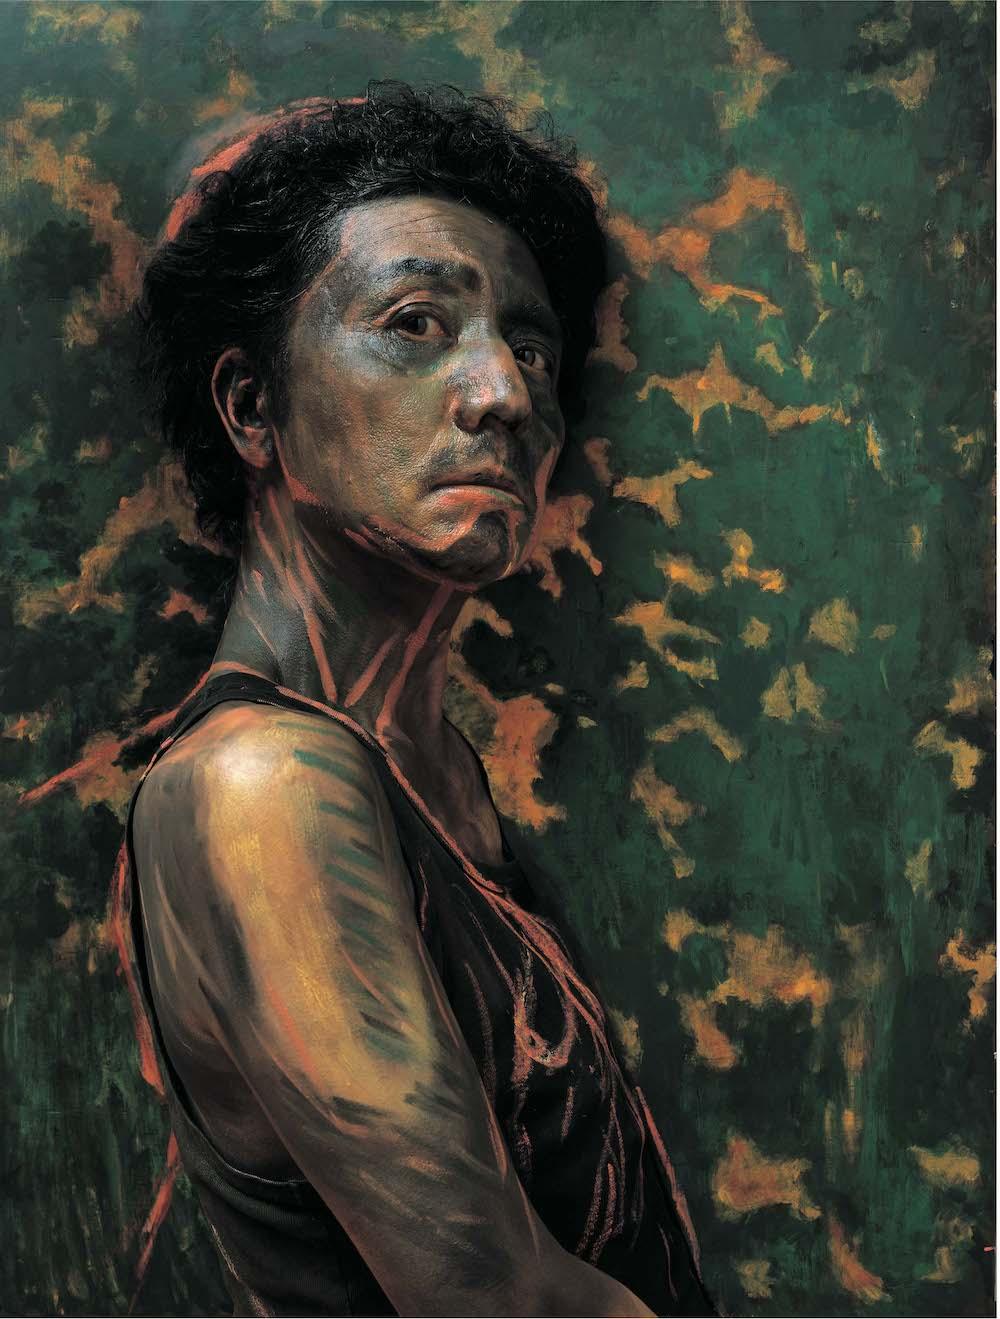 MORIMURA Yasumasa《Self Portrait / Youth (Aoki) 》2016/2021, collection of the artist